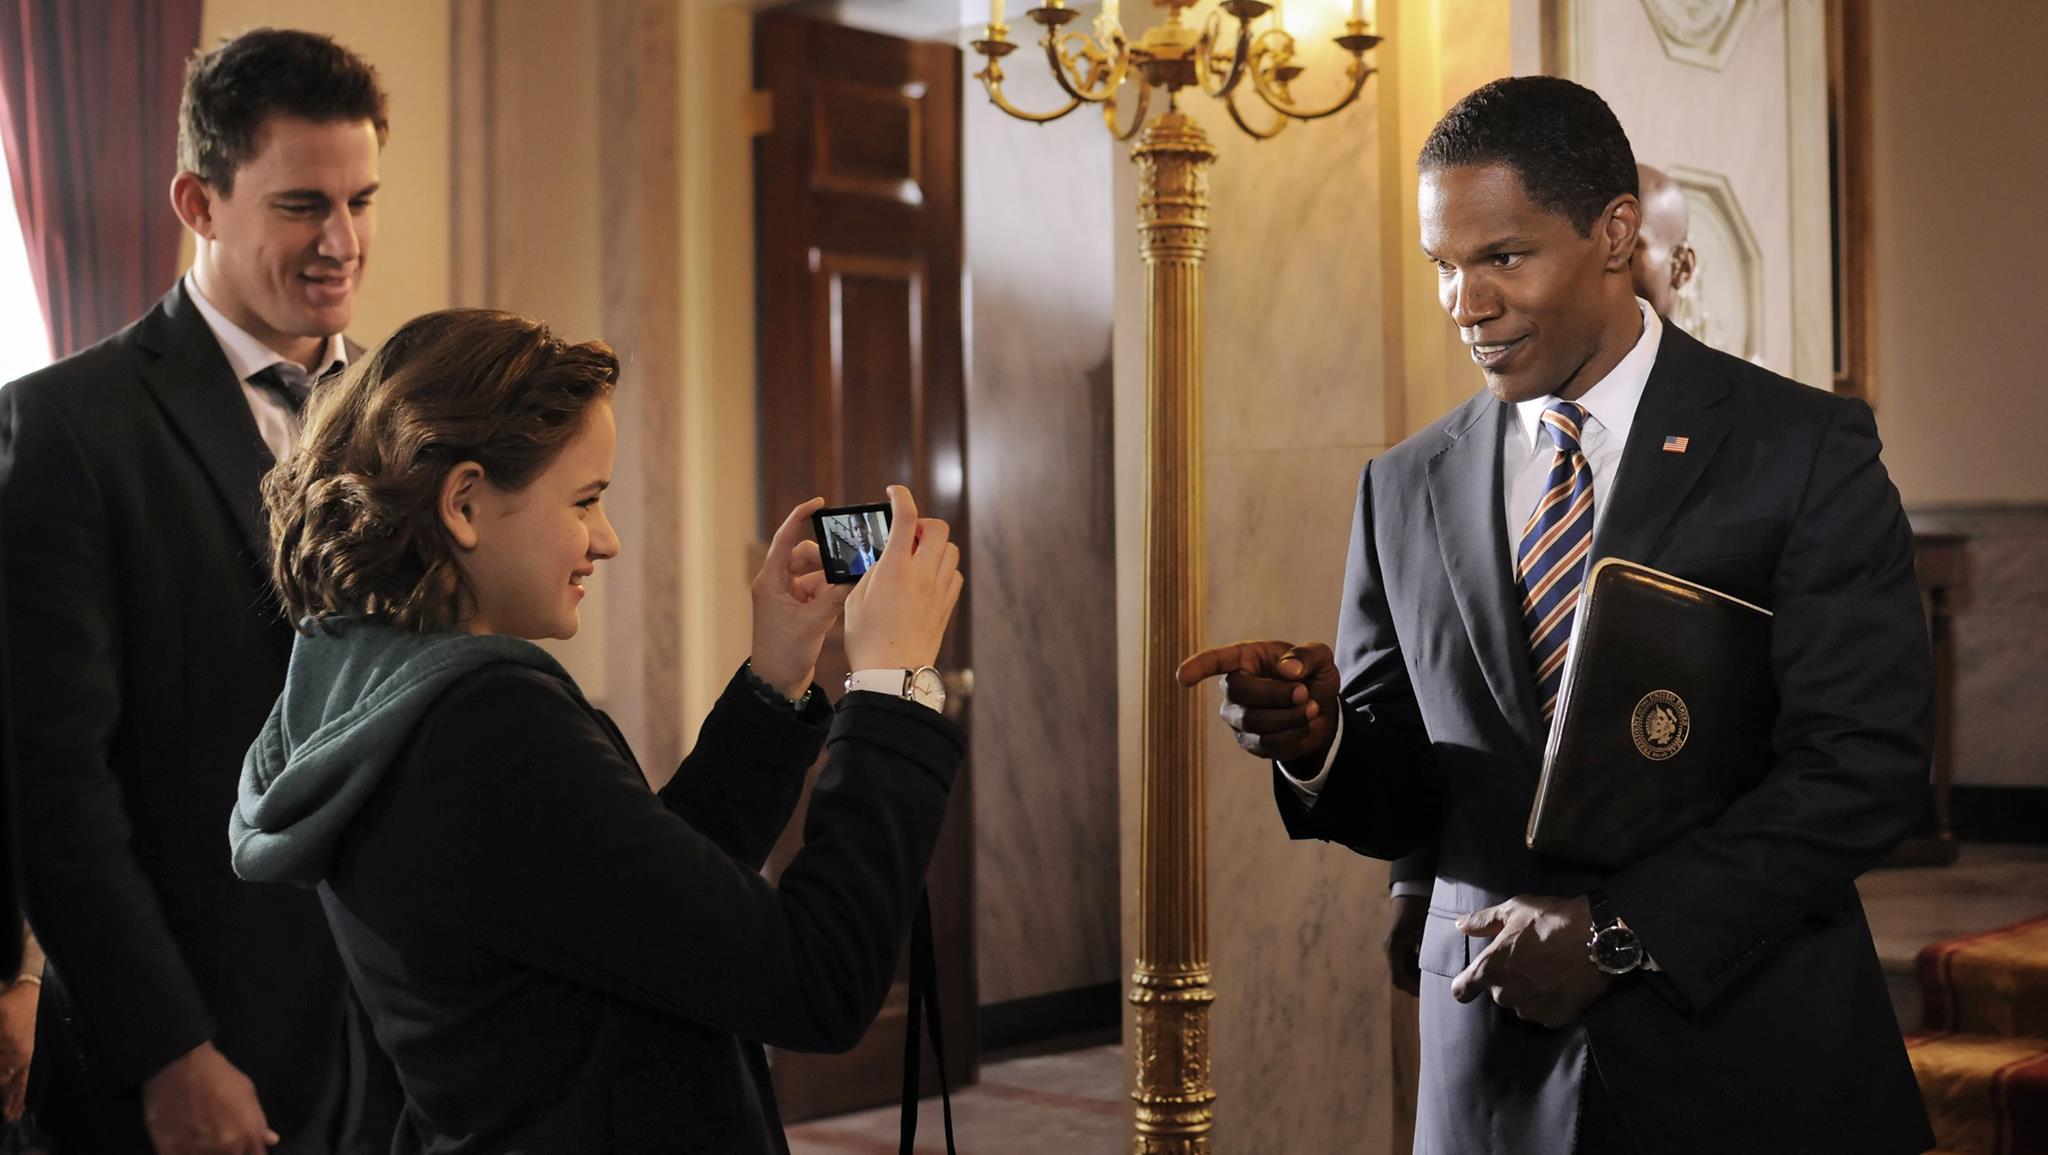 White House Down 2013 Photo Gallery Imdb